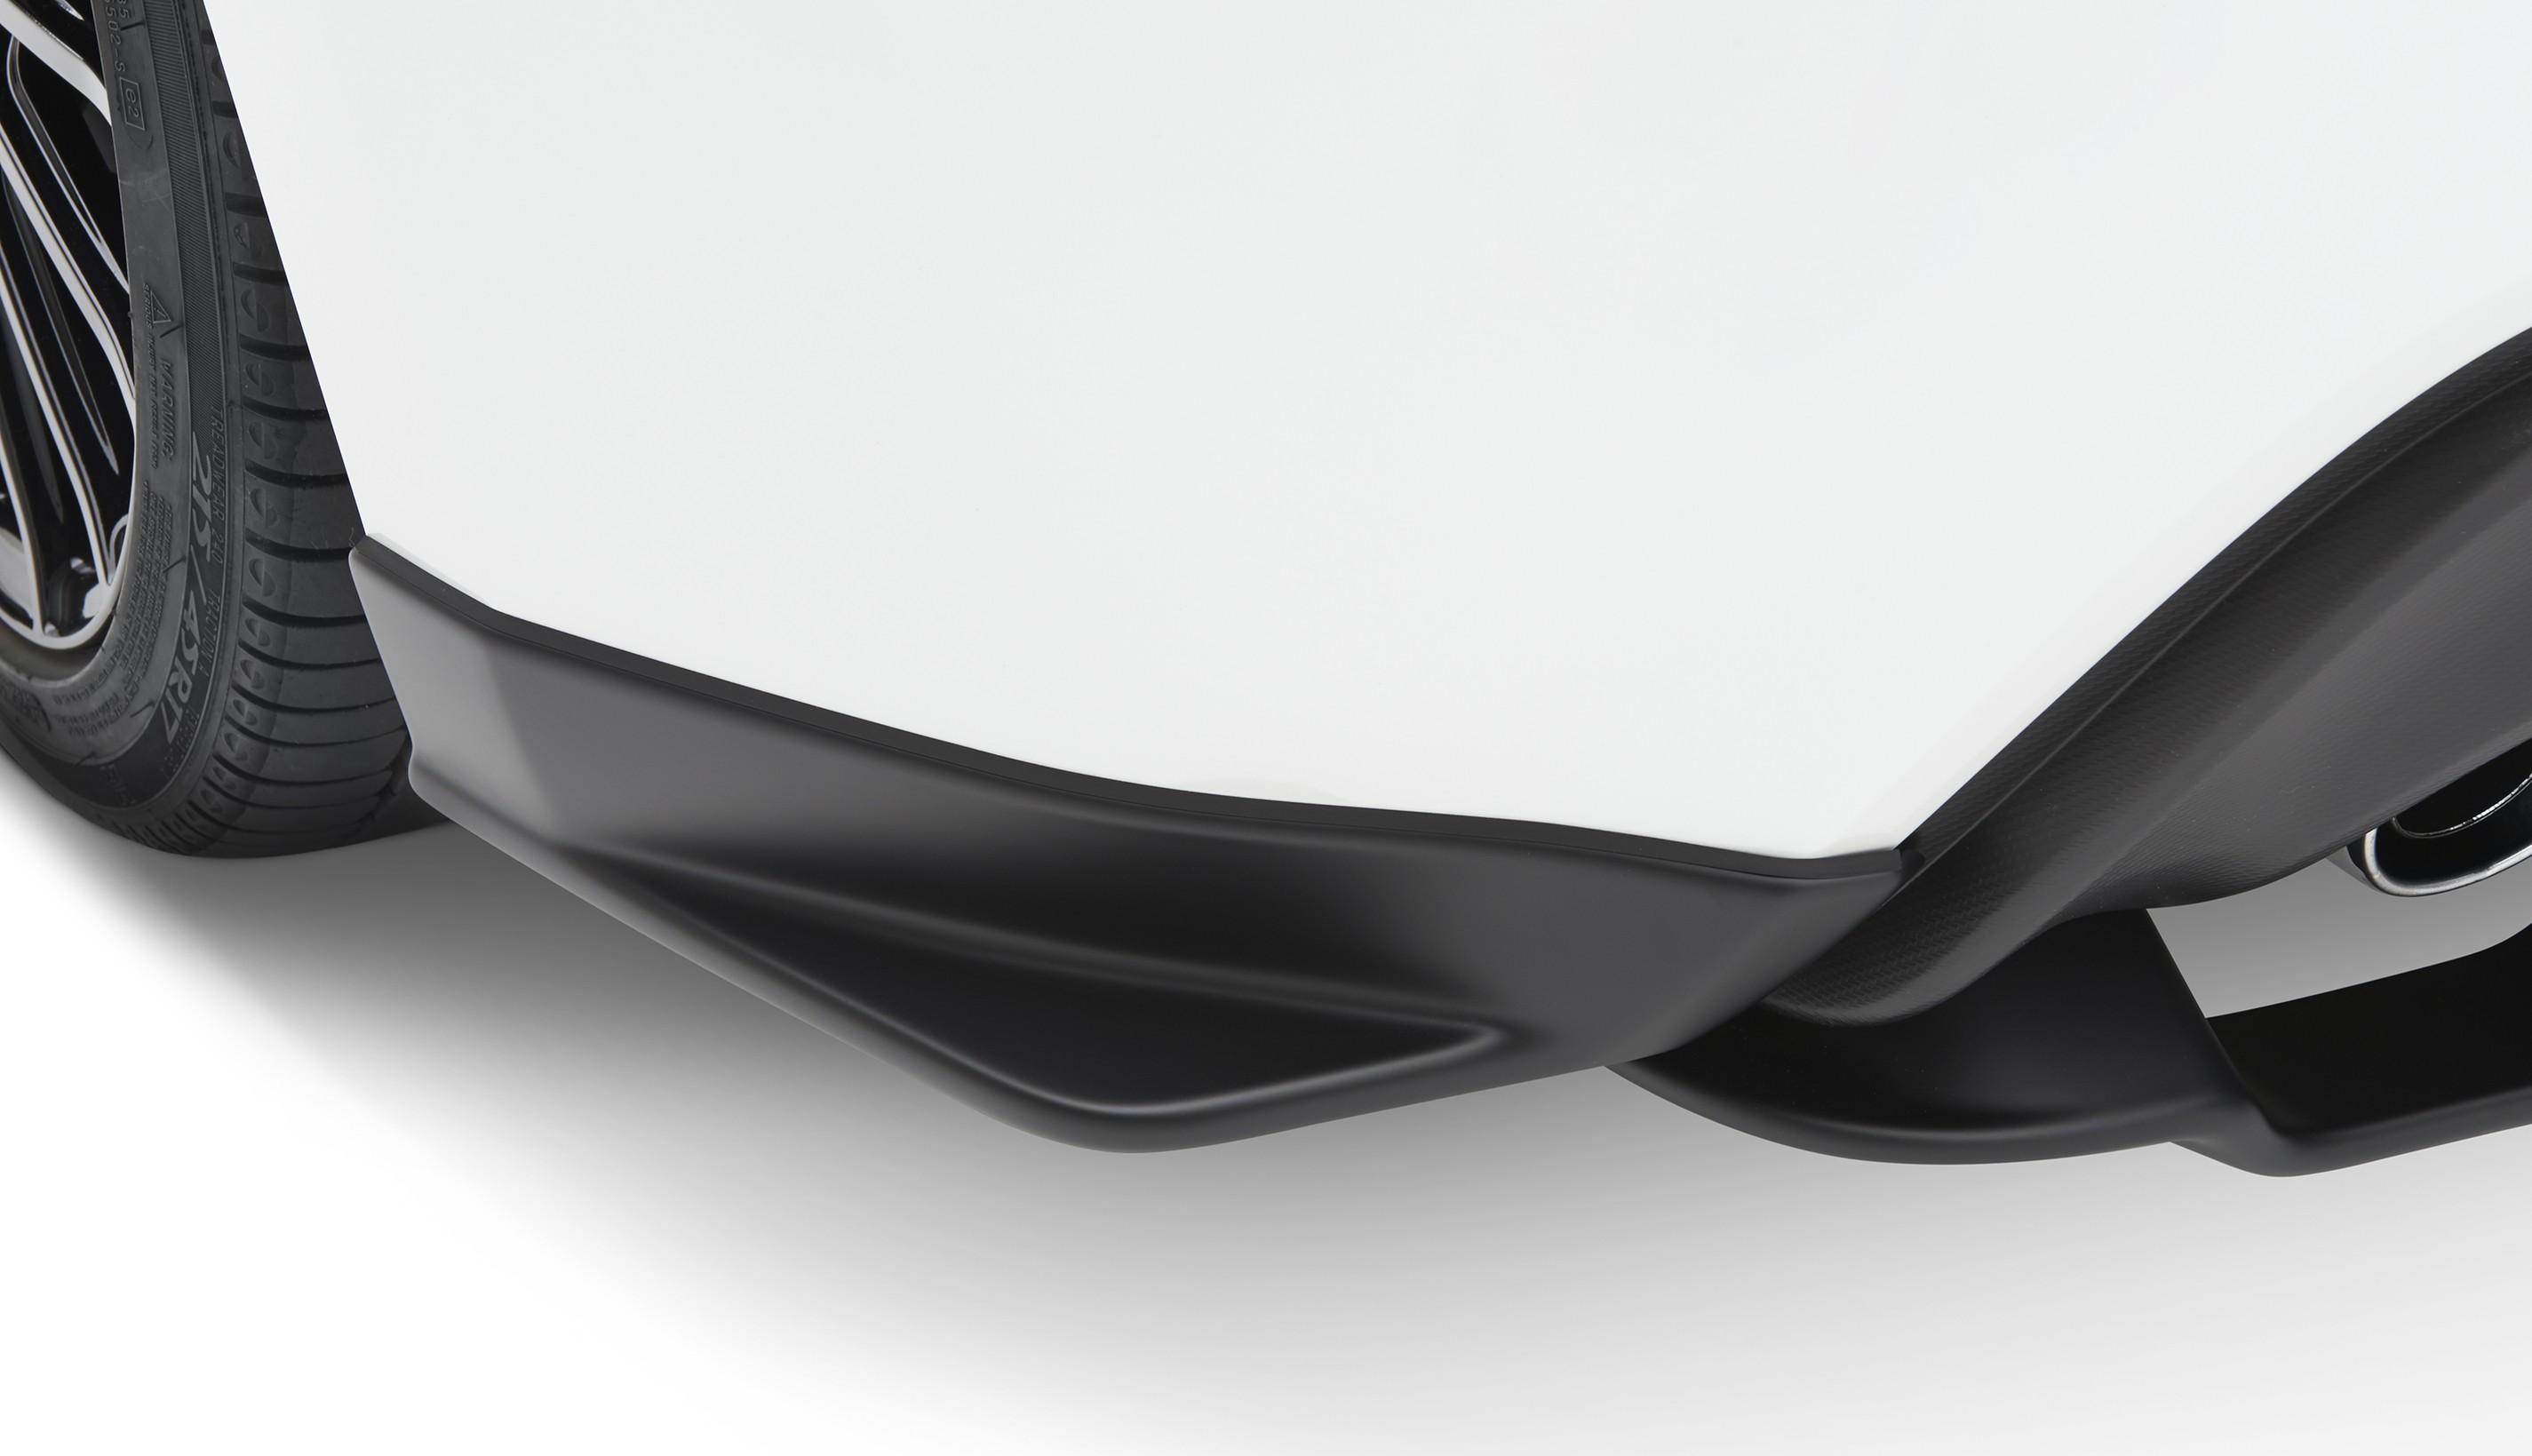 Subaru STI Under Spoiler Rear Sides